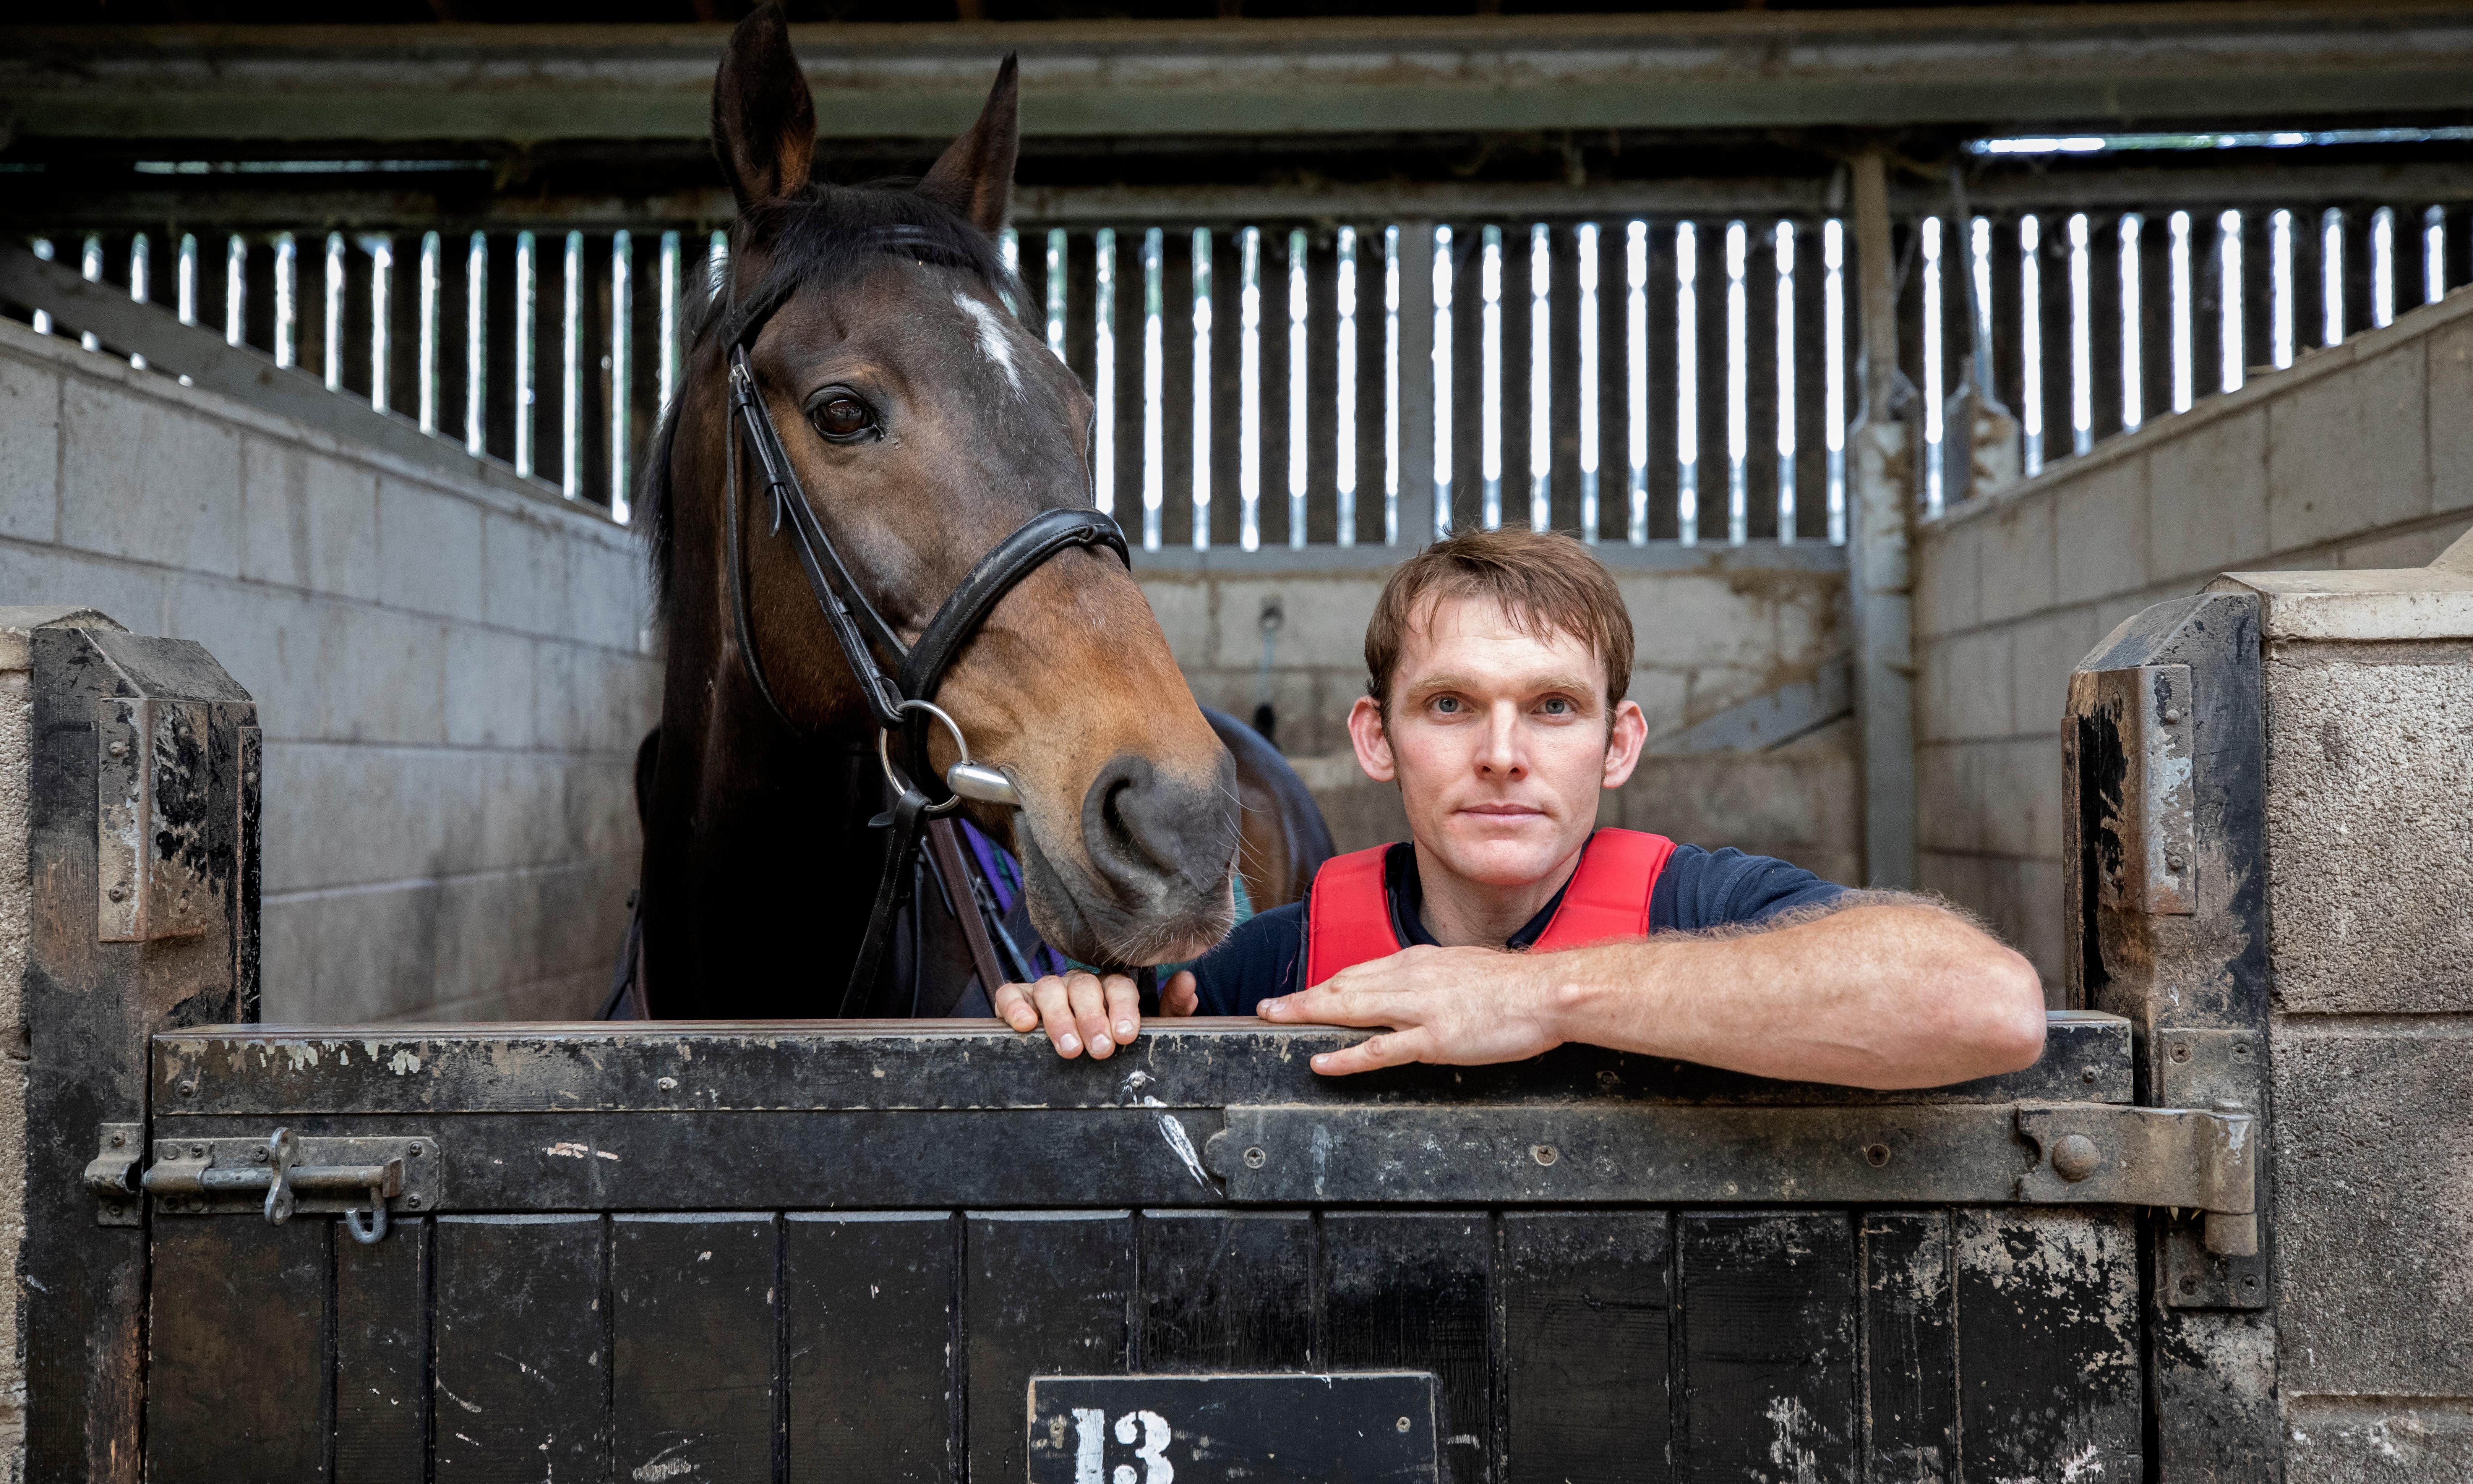 'It feels a bit surreal' – meet Jay Tabb, the footballer who now rides horses